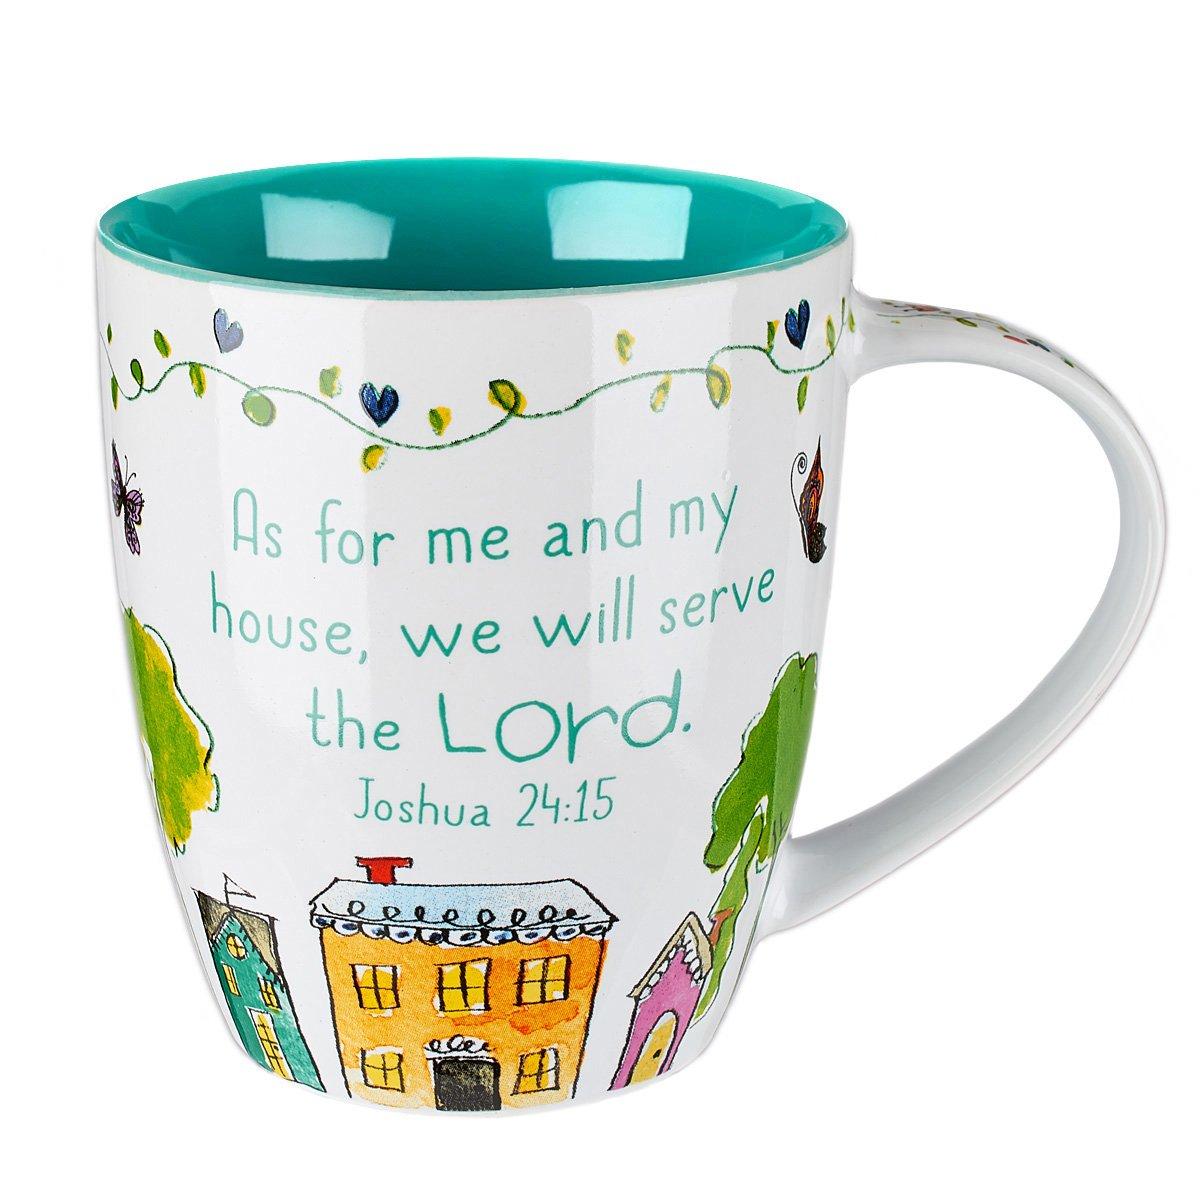 Everyday Blessings ''Bless Our Home'' Mug - Joshua 24:15